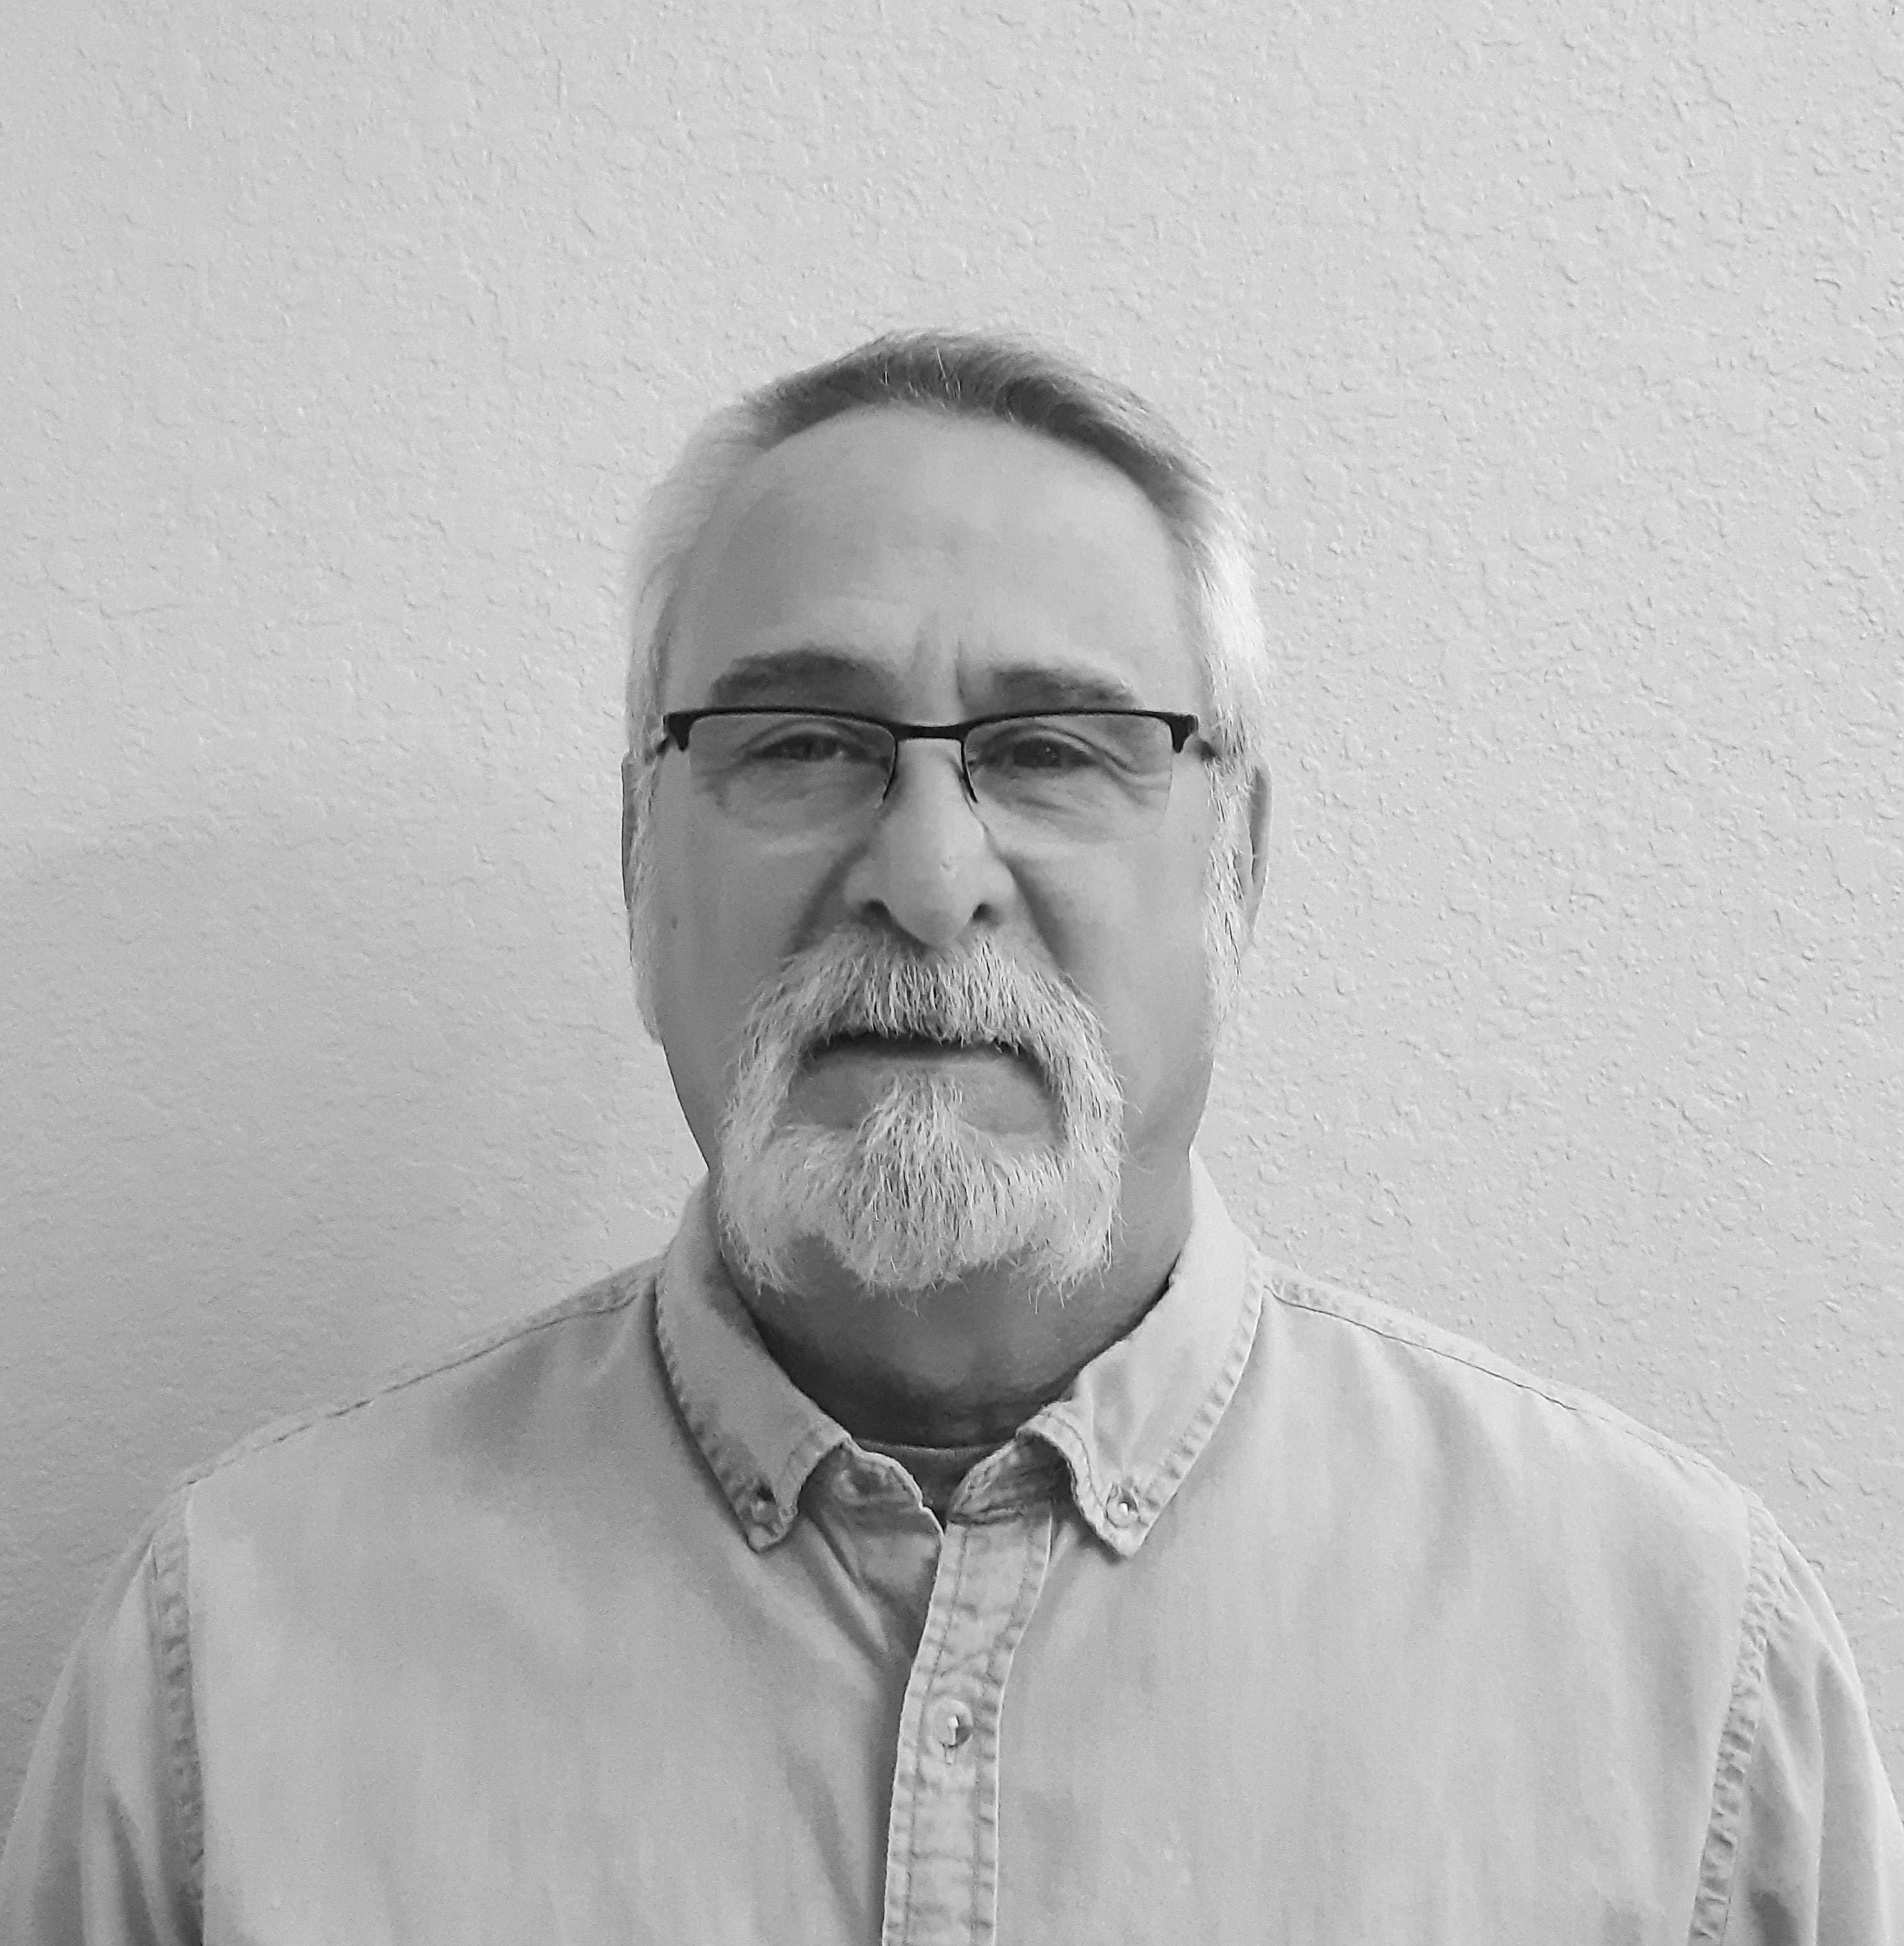 Don West | AbeTech Headshot